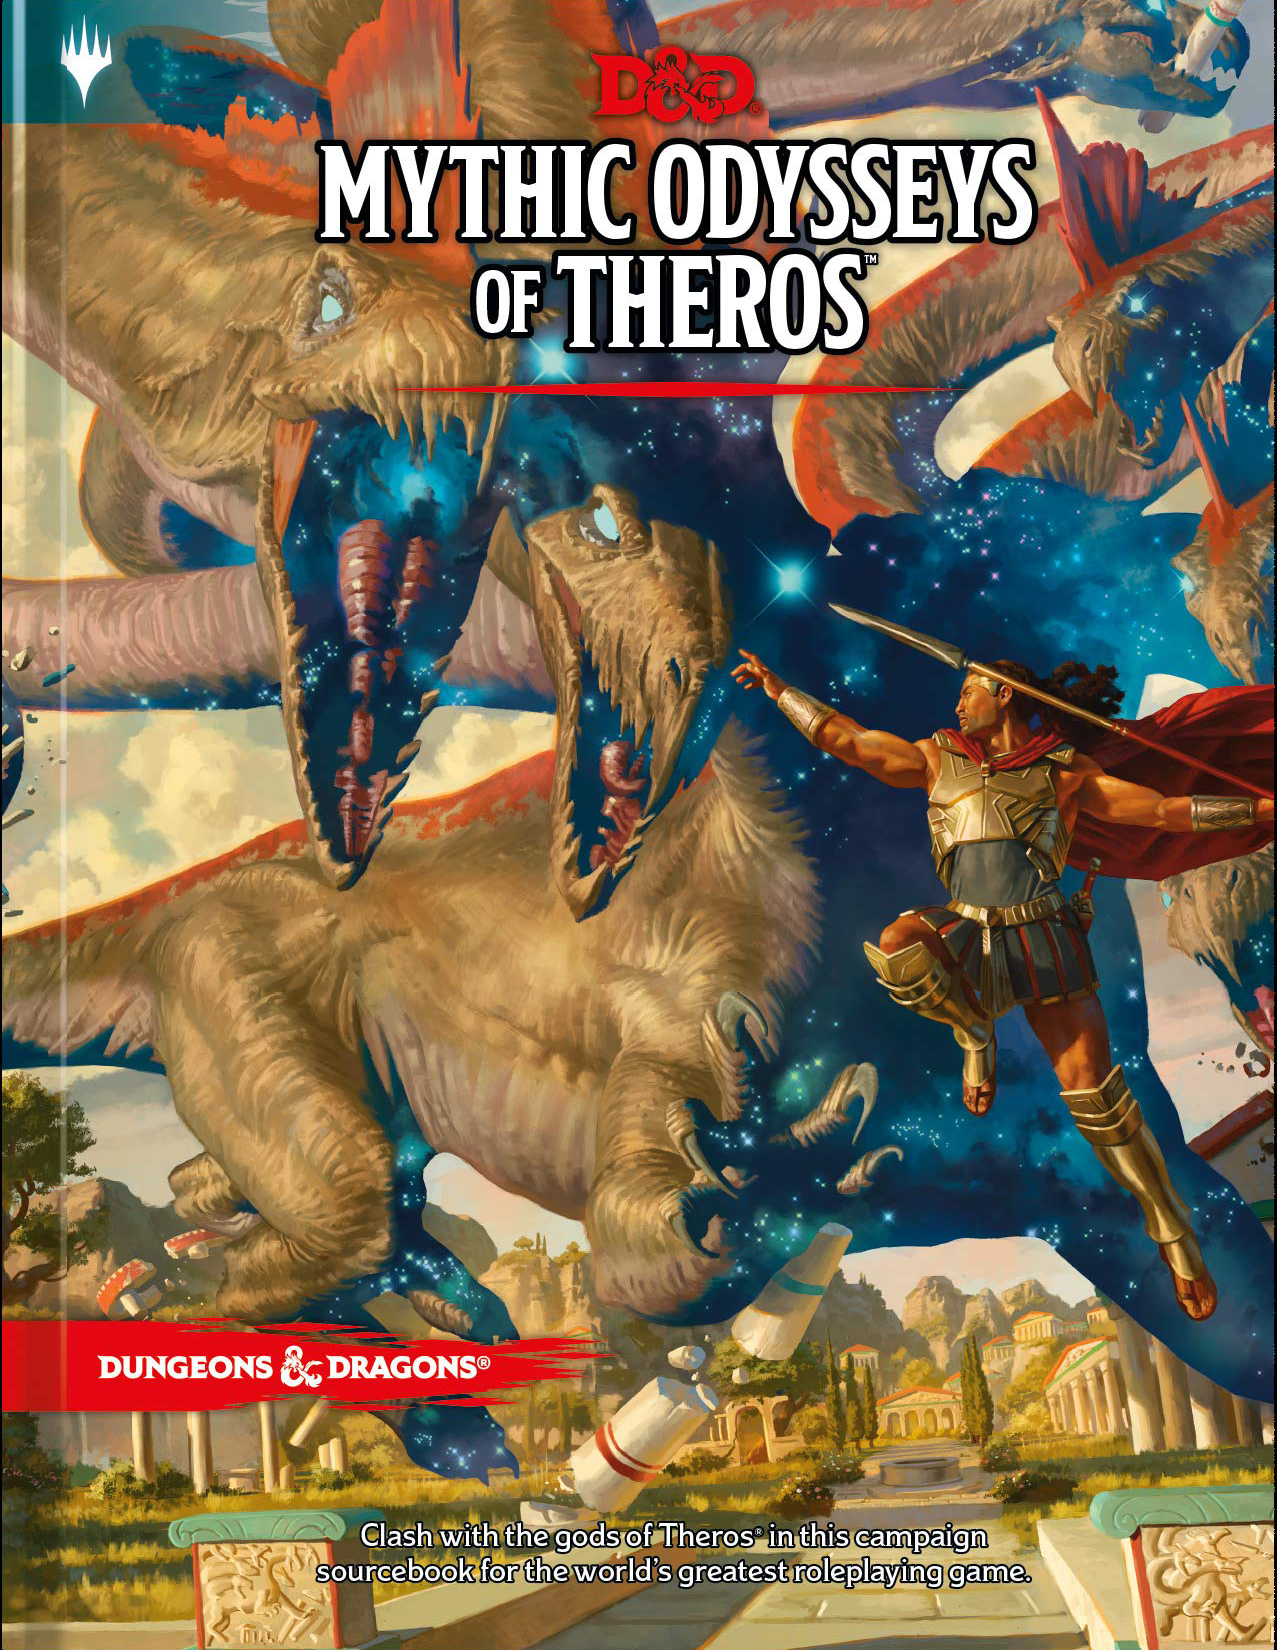 D&D 5.0: Mythic Odysseys of Theros